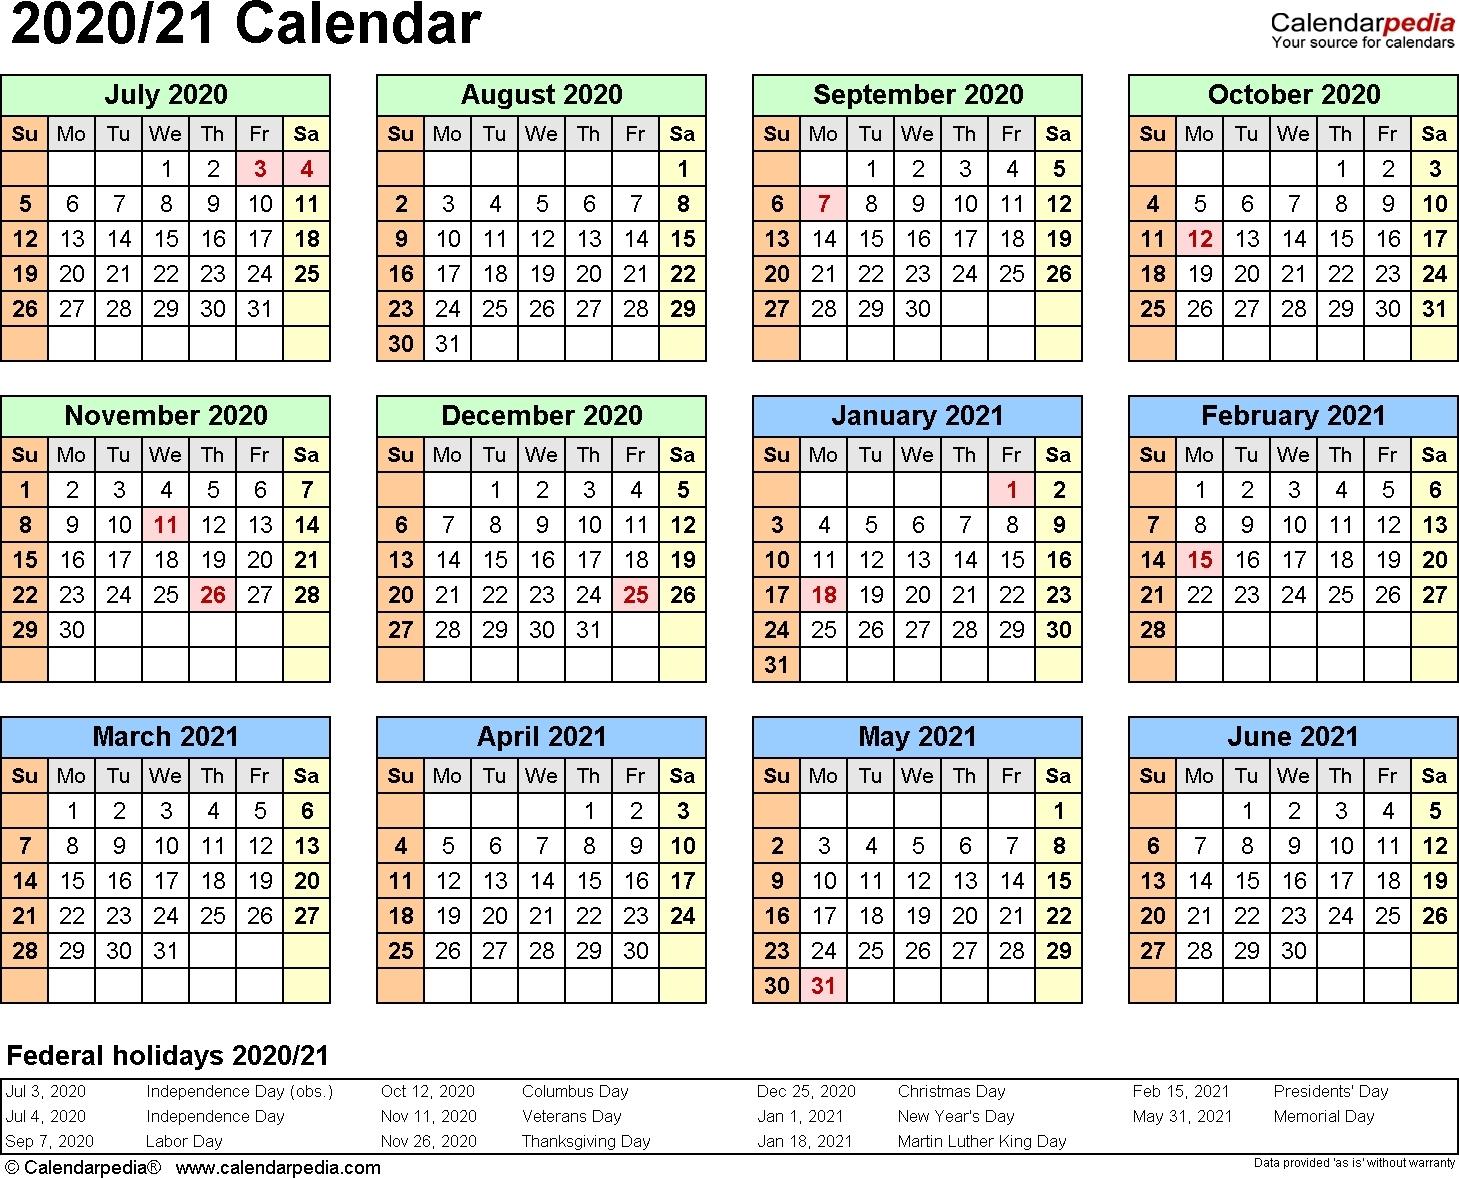 Calendarpedia 2020 Excel | Calendar For Planning  2021 19 Financial Year Calendar